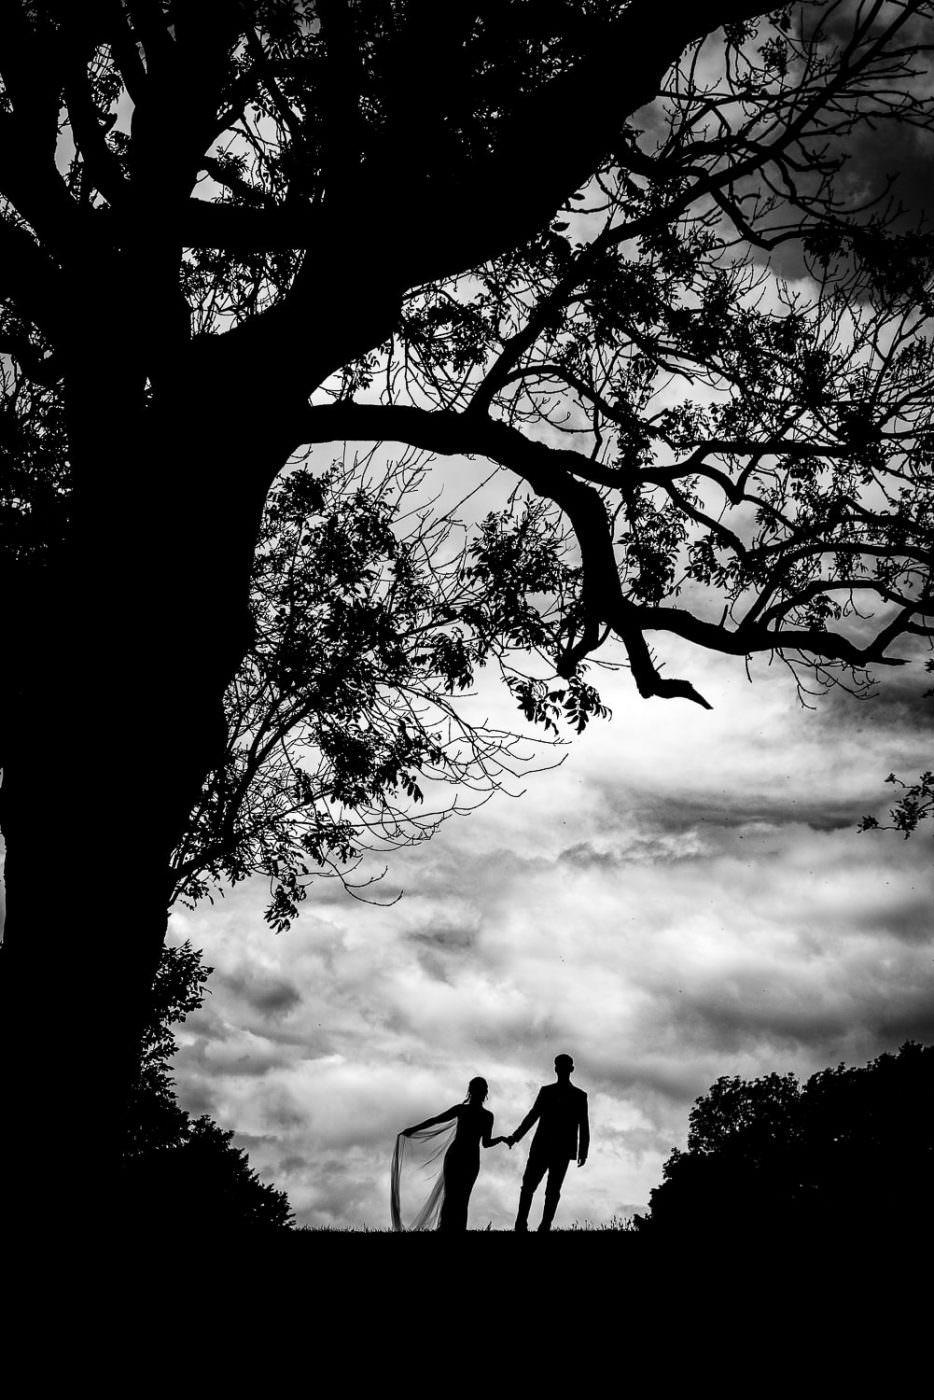 Wedding photography, black horse beamish wedding photography, bride and groom